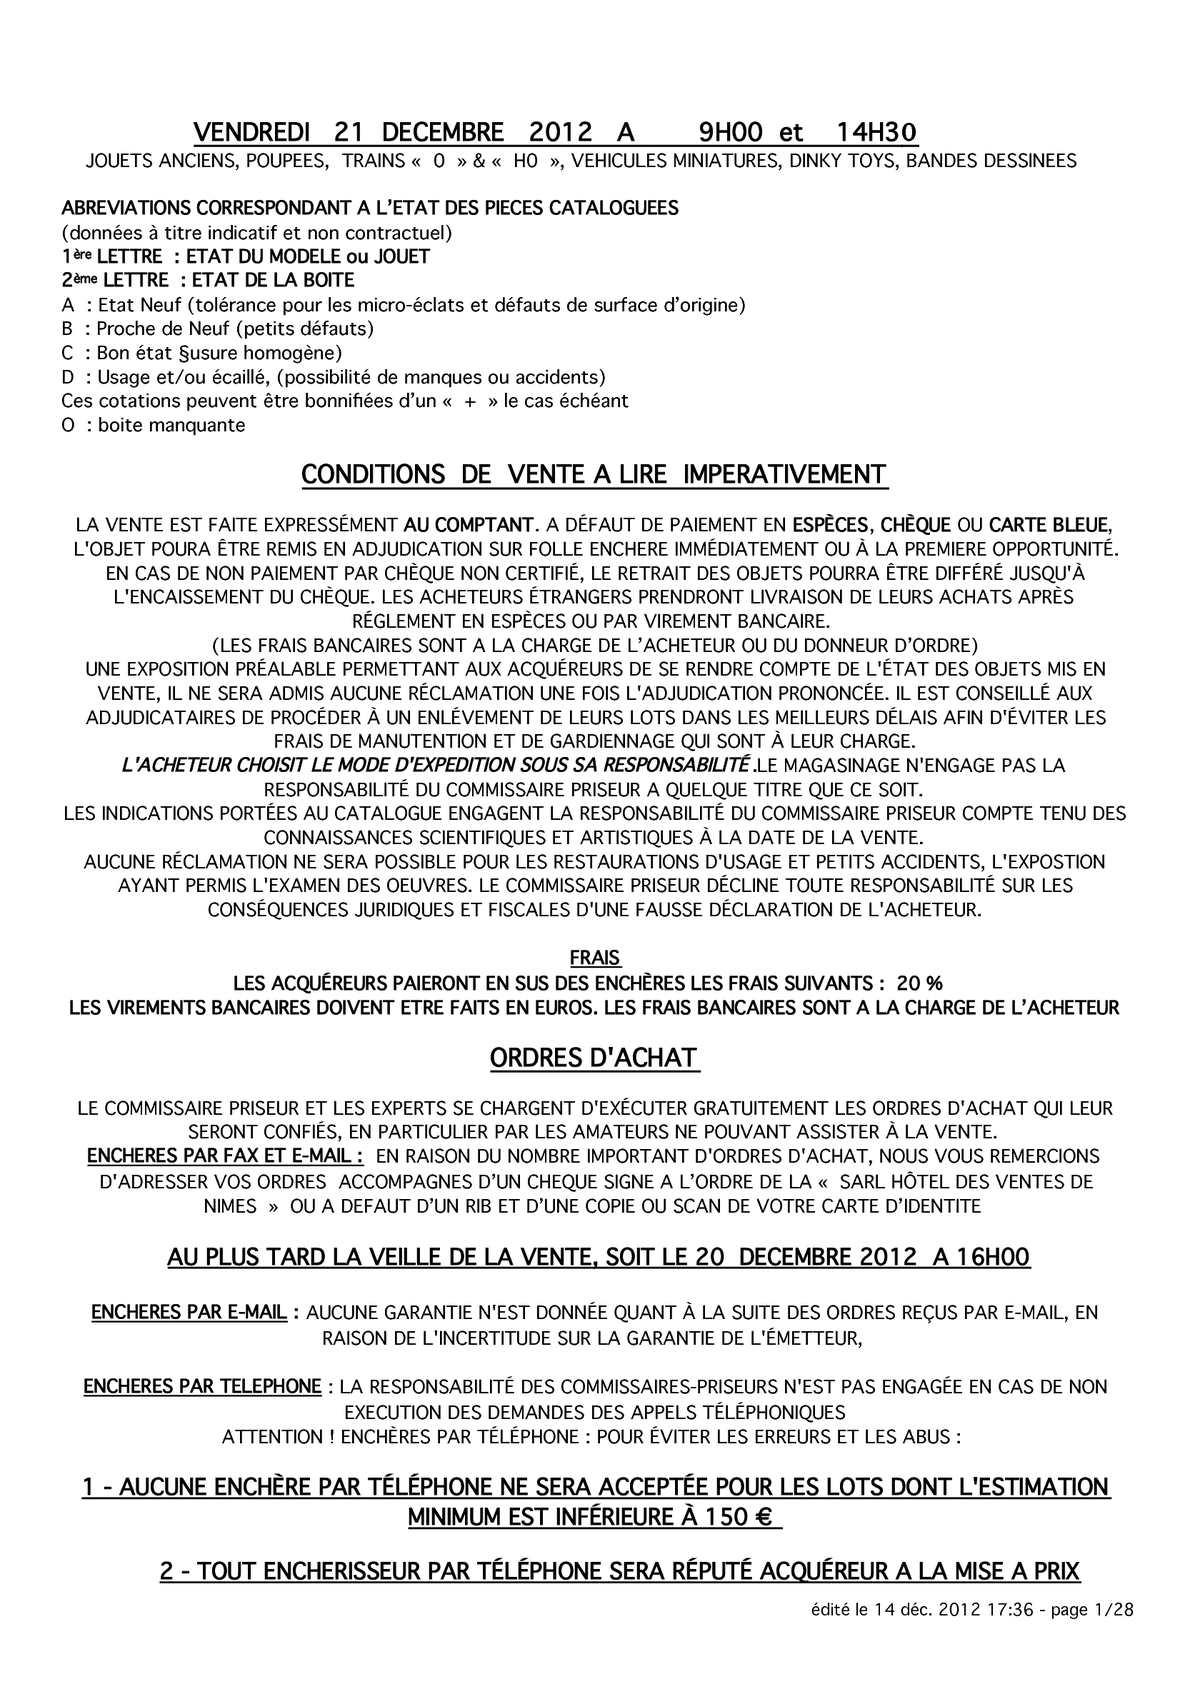 VEREM ACCESSOIRES D/'ORIGINE RENAULT R 390 PHARES CAPUCHONS GYROPHARES